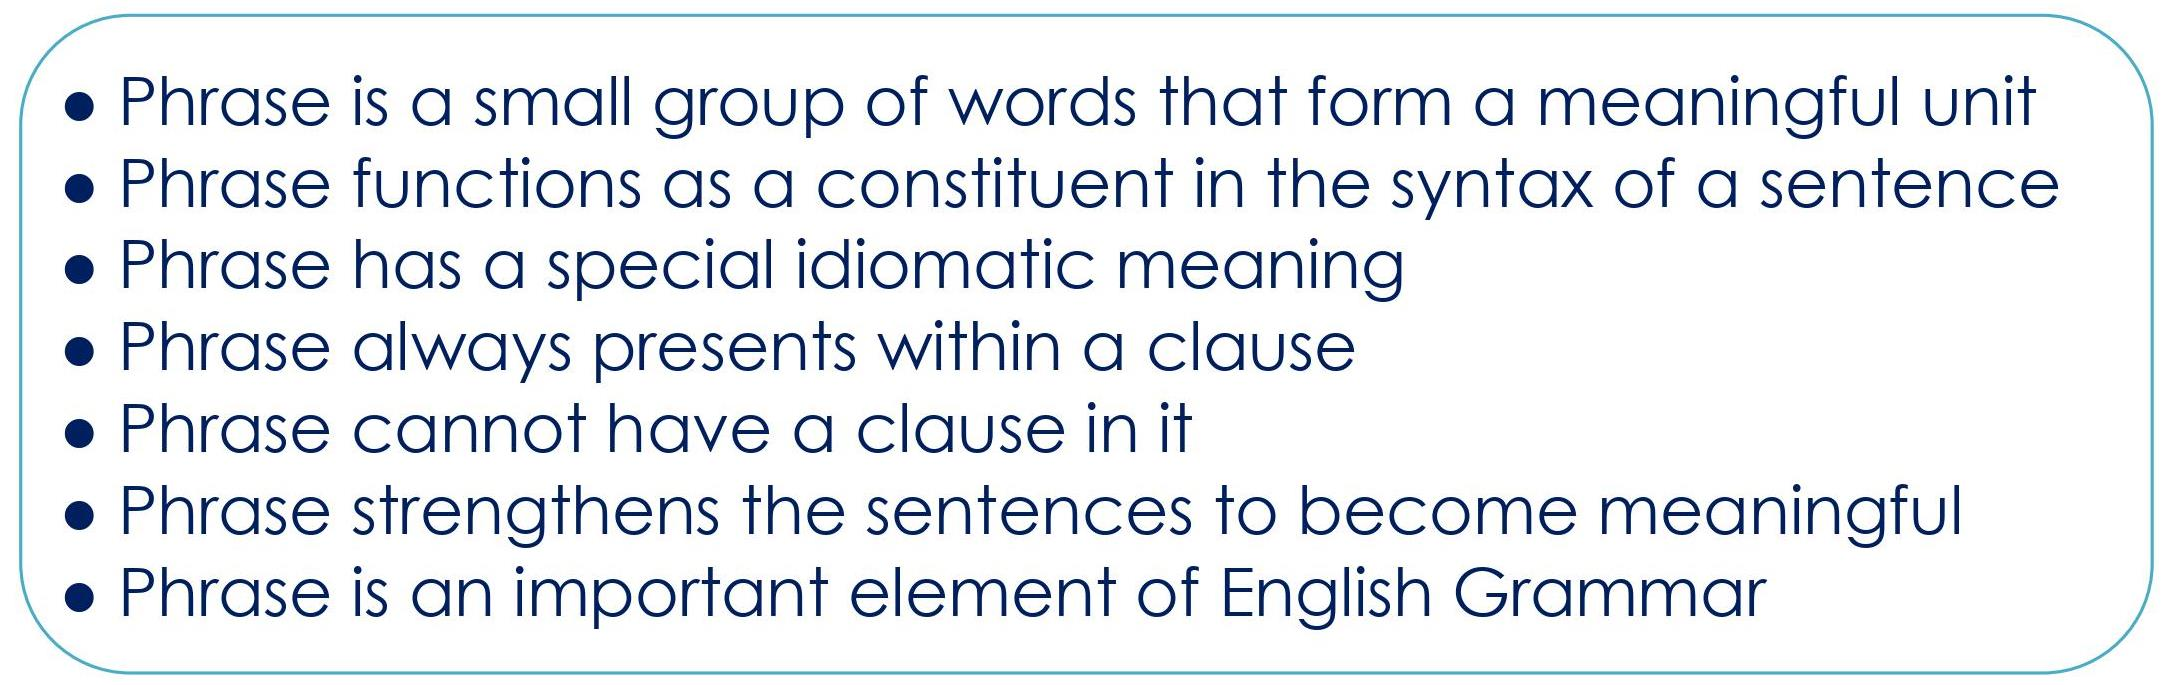 ENGLISH GRAMMAR PHRASES